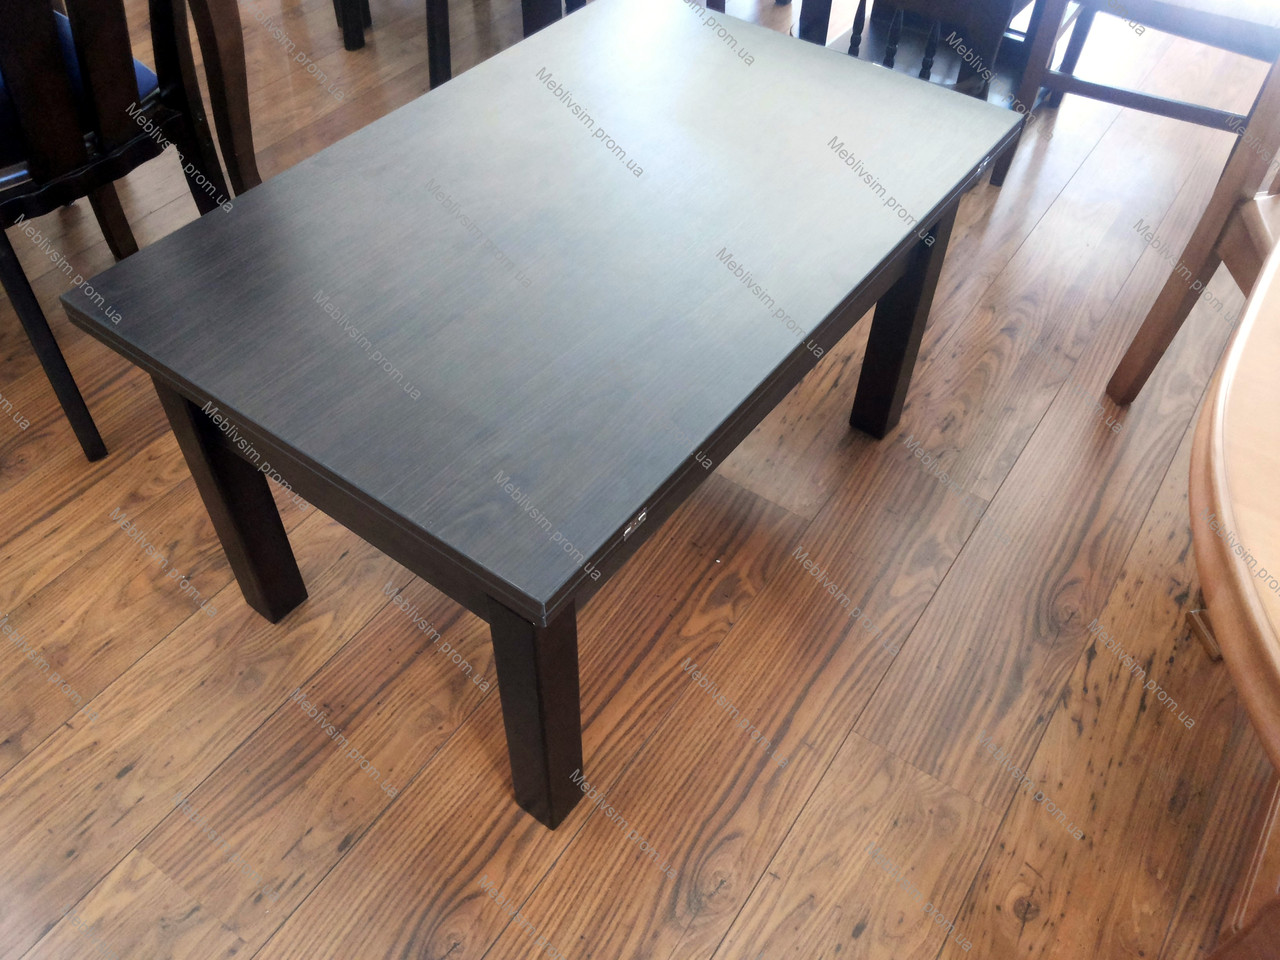 Кухонный стол трансформер Флай Fn , венге